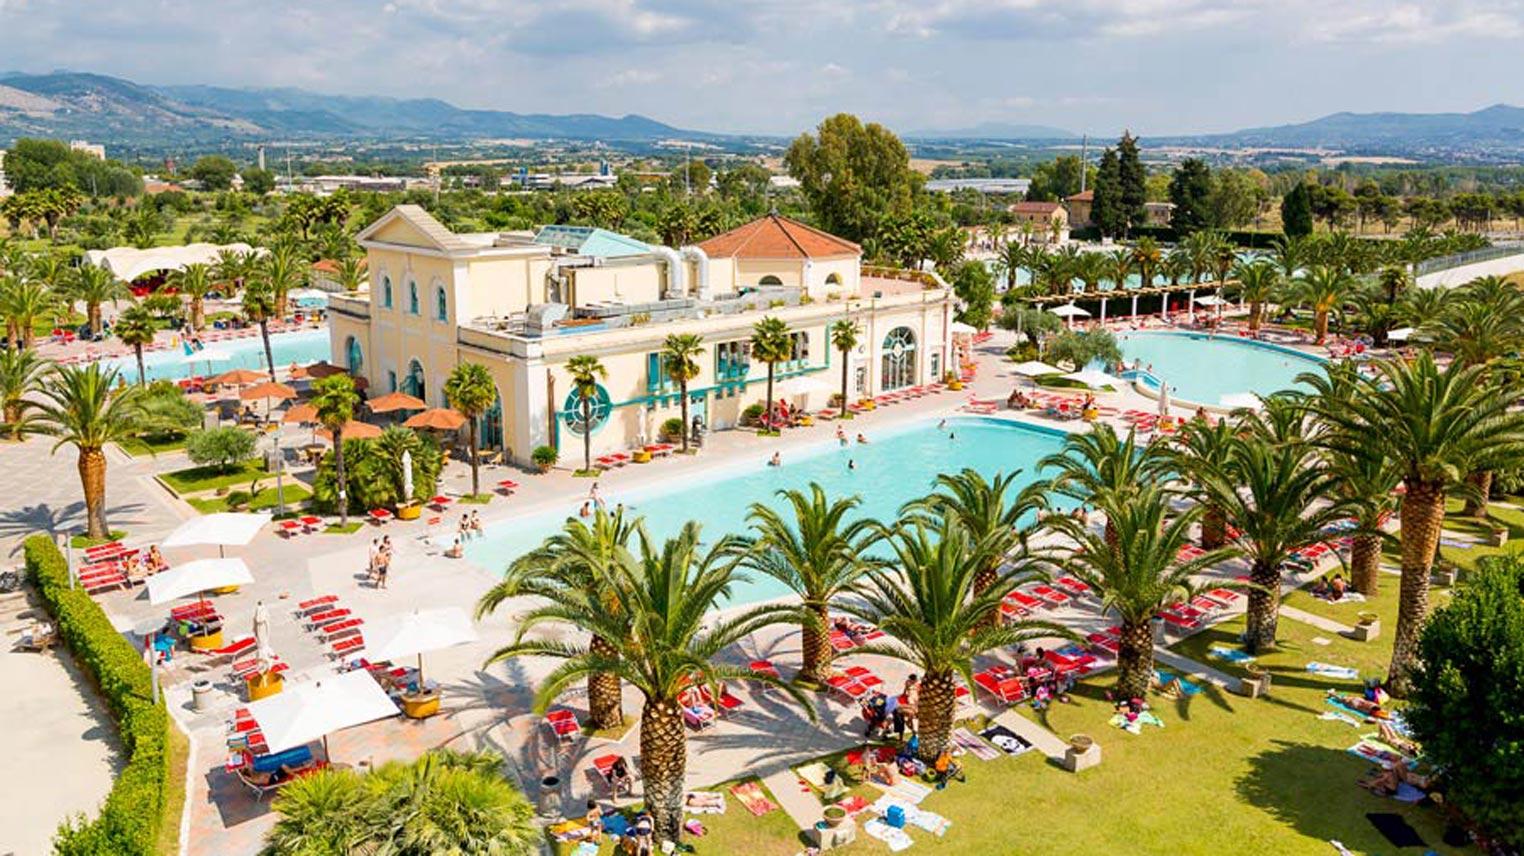 Hotel Terme Tivoli